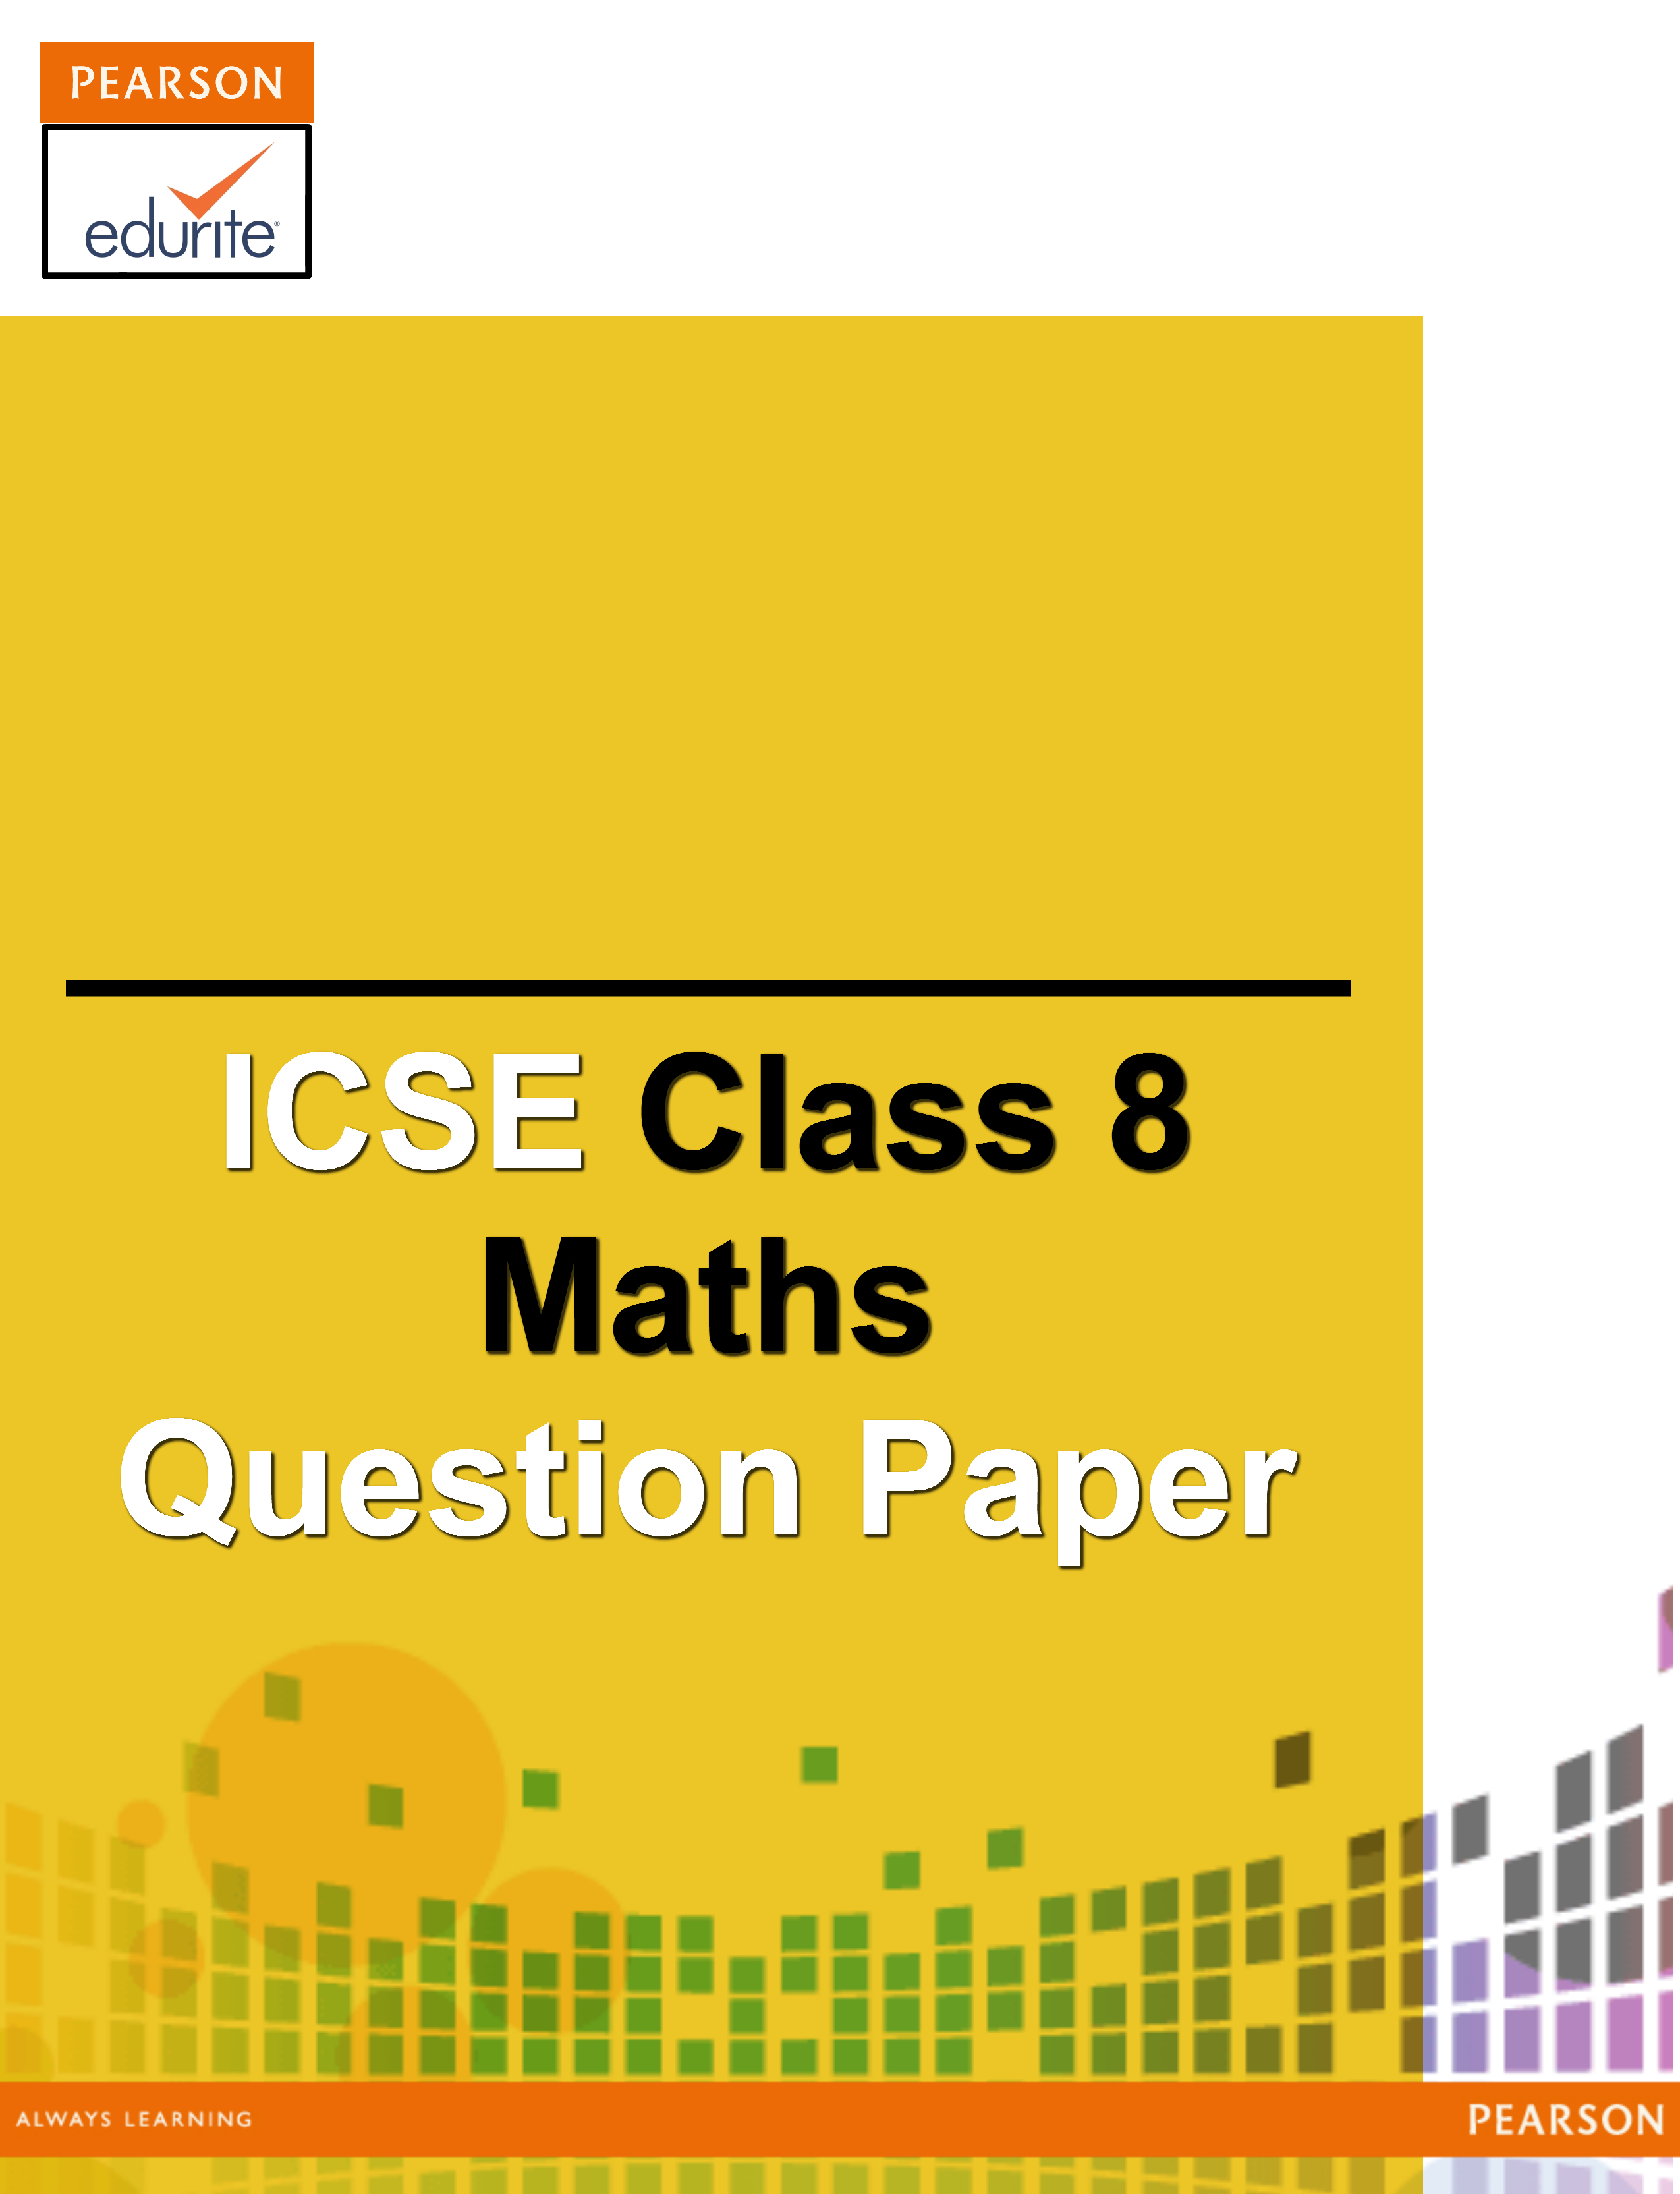 worksheet Maths Worksheets For Class 8 Icse icse class 8 maths question paper httpicse edurite comicse com